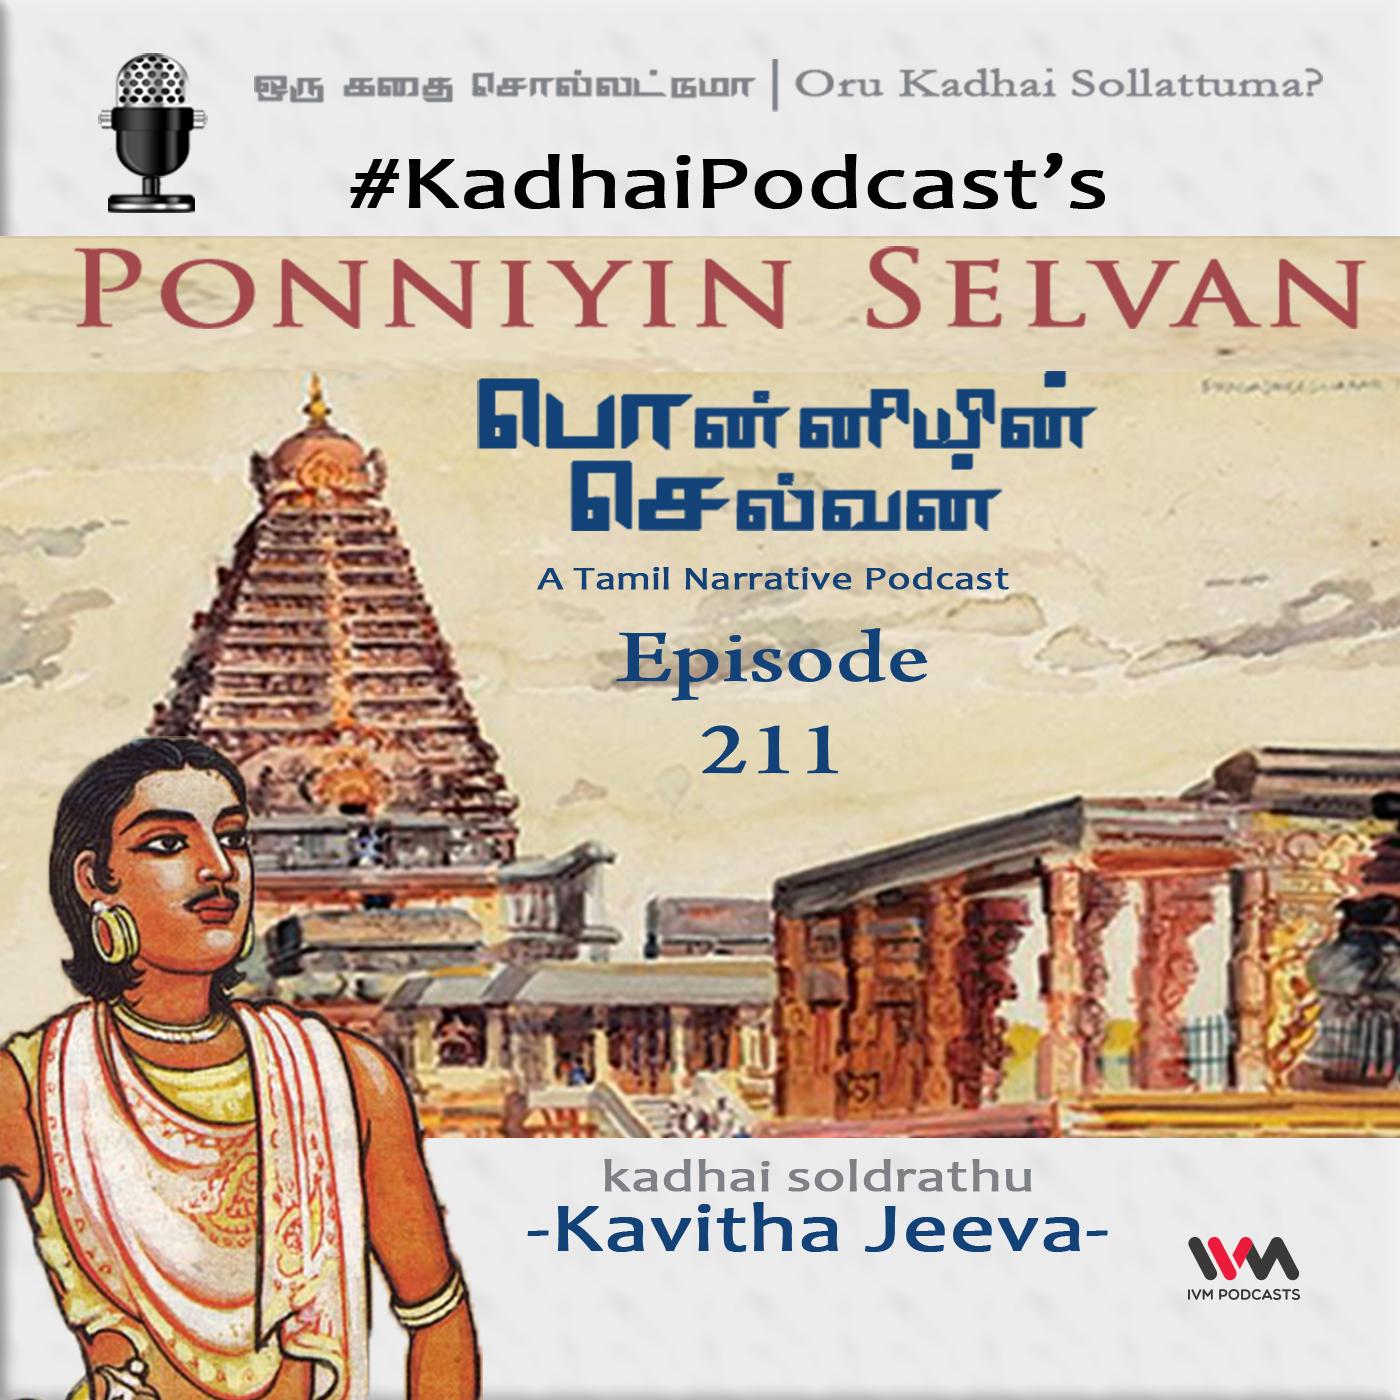 KadhaiPodcast's Ponniyin Selvan - Episode # 211